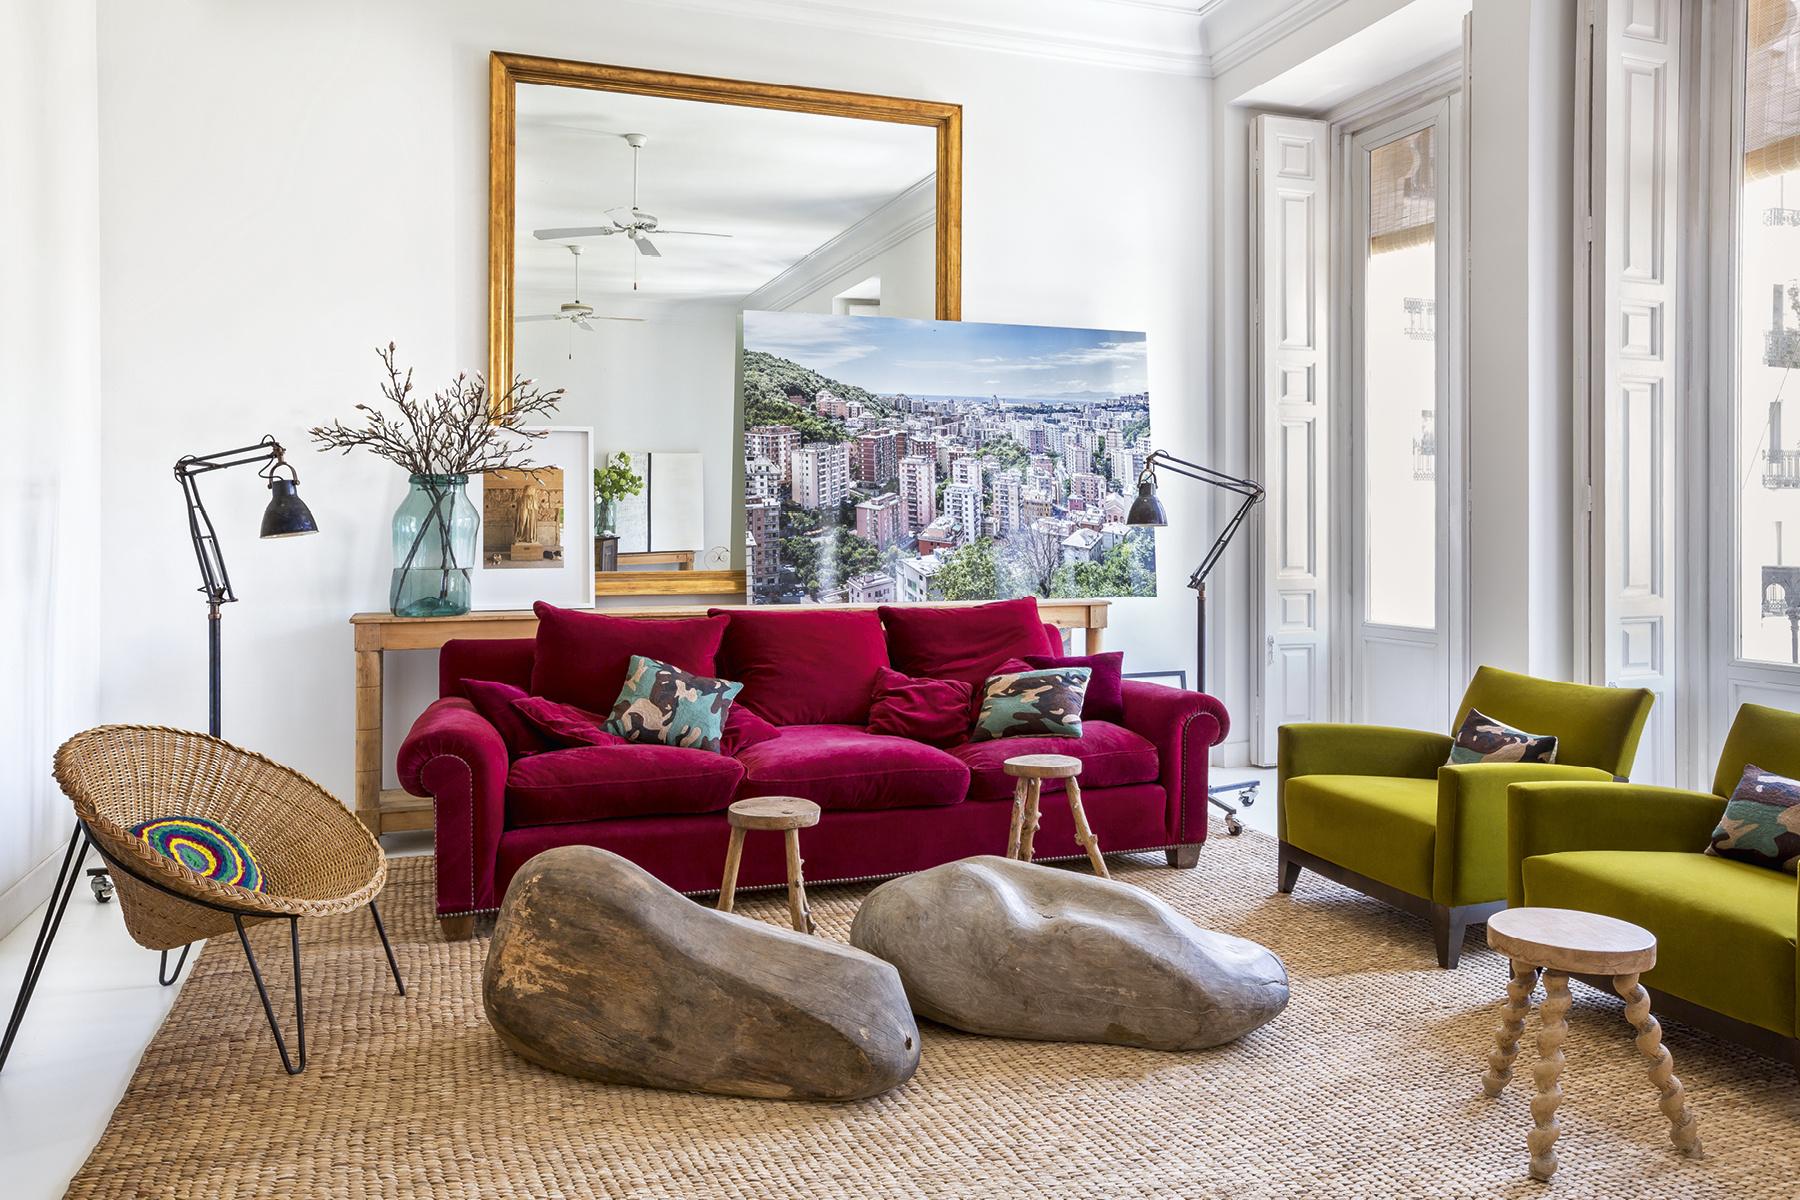 Colourful Bohemien Home, Madrid Interior, Boho Apartment, Fucsia Home  Decor, Italianbark Interior